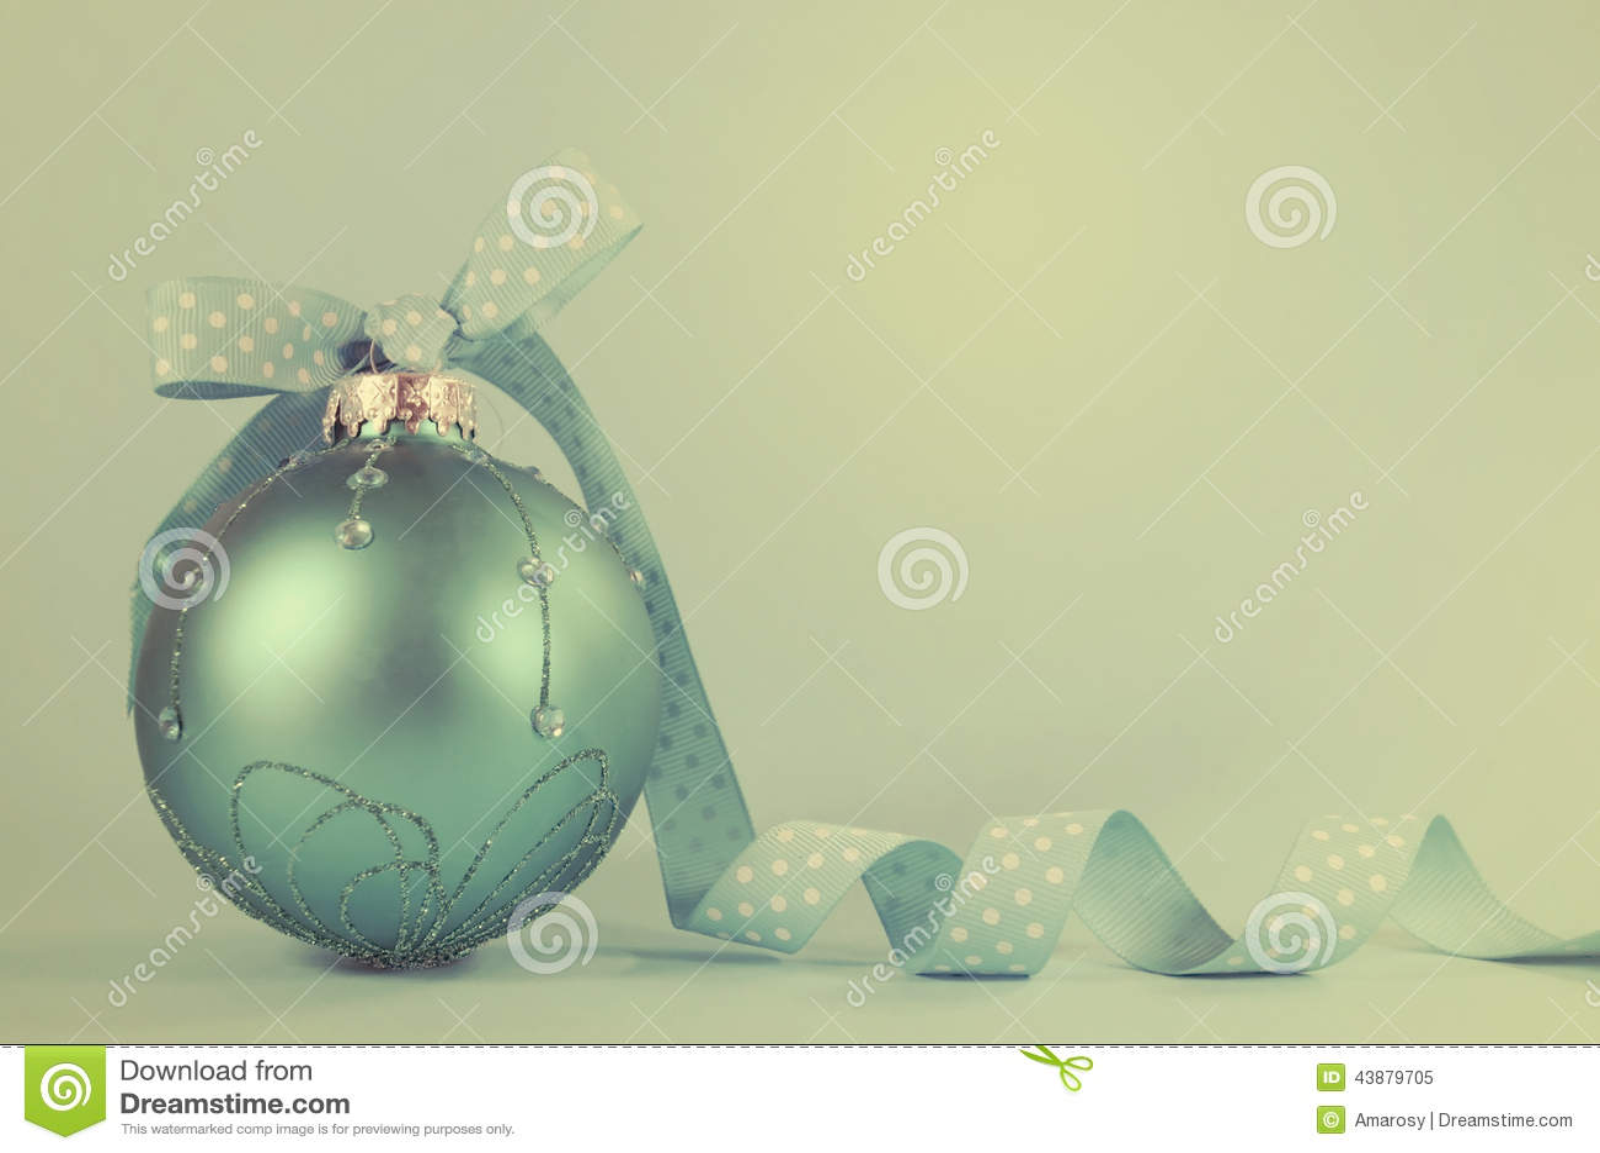 Retro Aqua Blue Christmas Tree Ornament Stock Photo - Image: 43879705